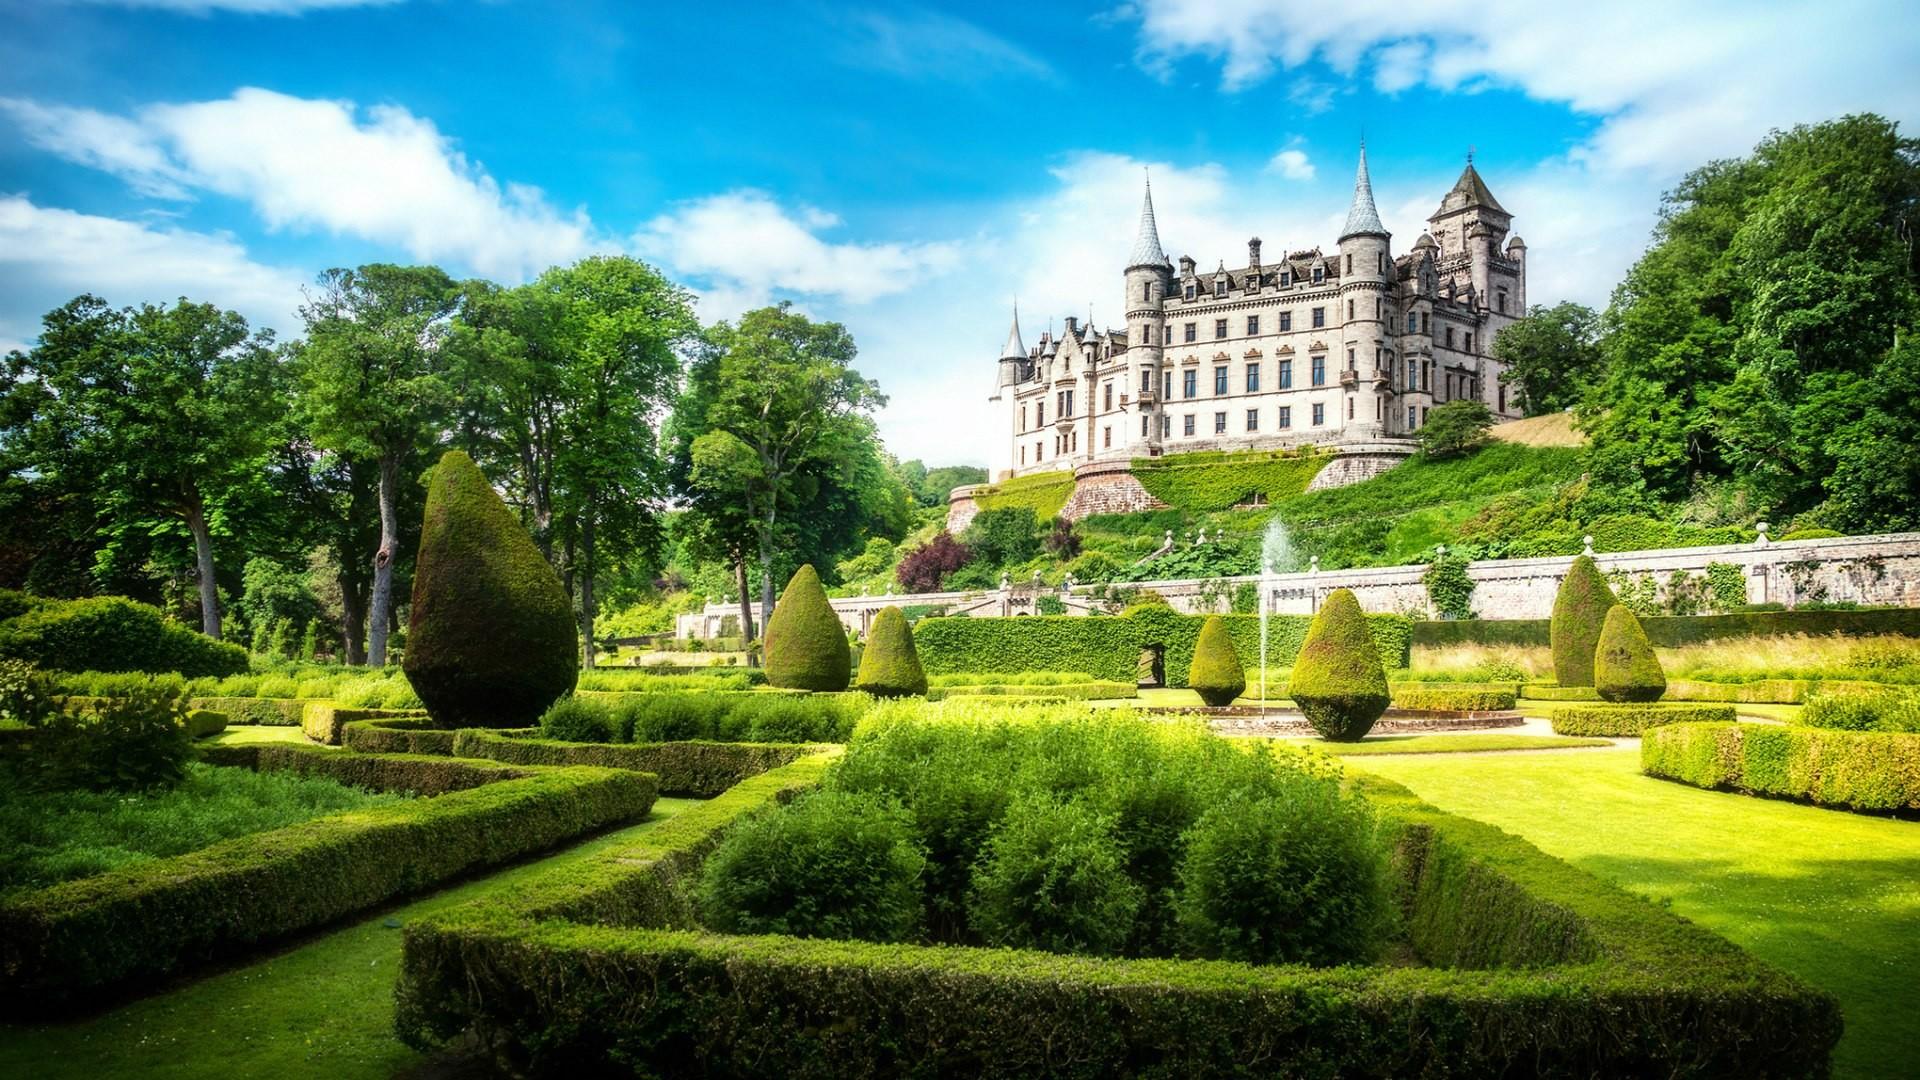 Explore Highlands Scotland, Castle Scotland, and more!